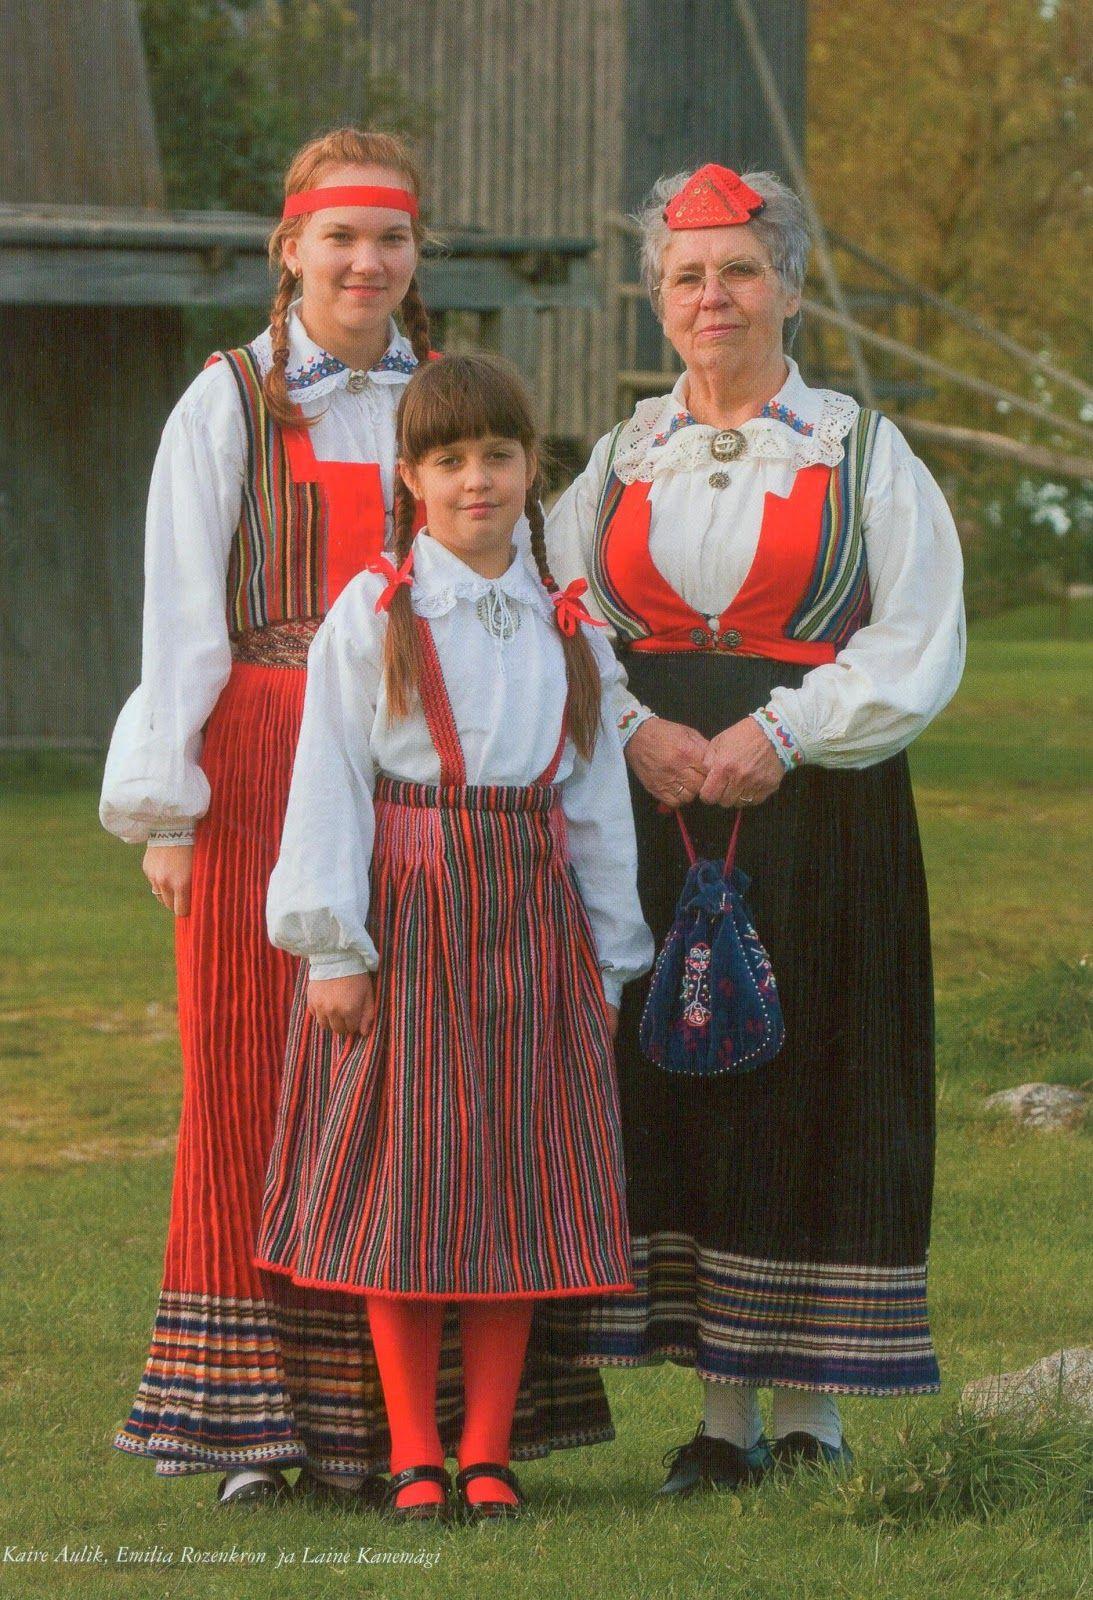 fd57c9b50ca Pin by Ra Ka on rahvarõivad | Traditional outfits, Folk costume ...